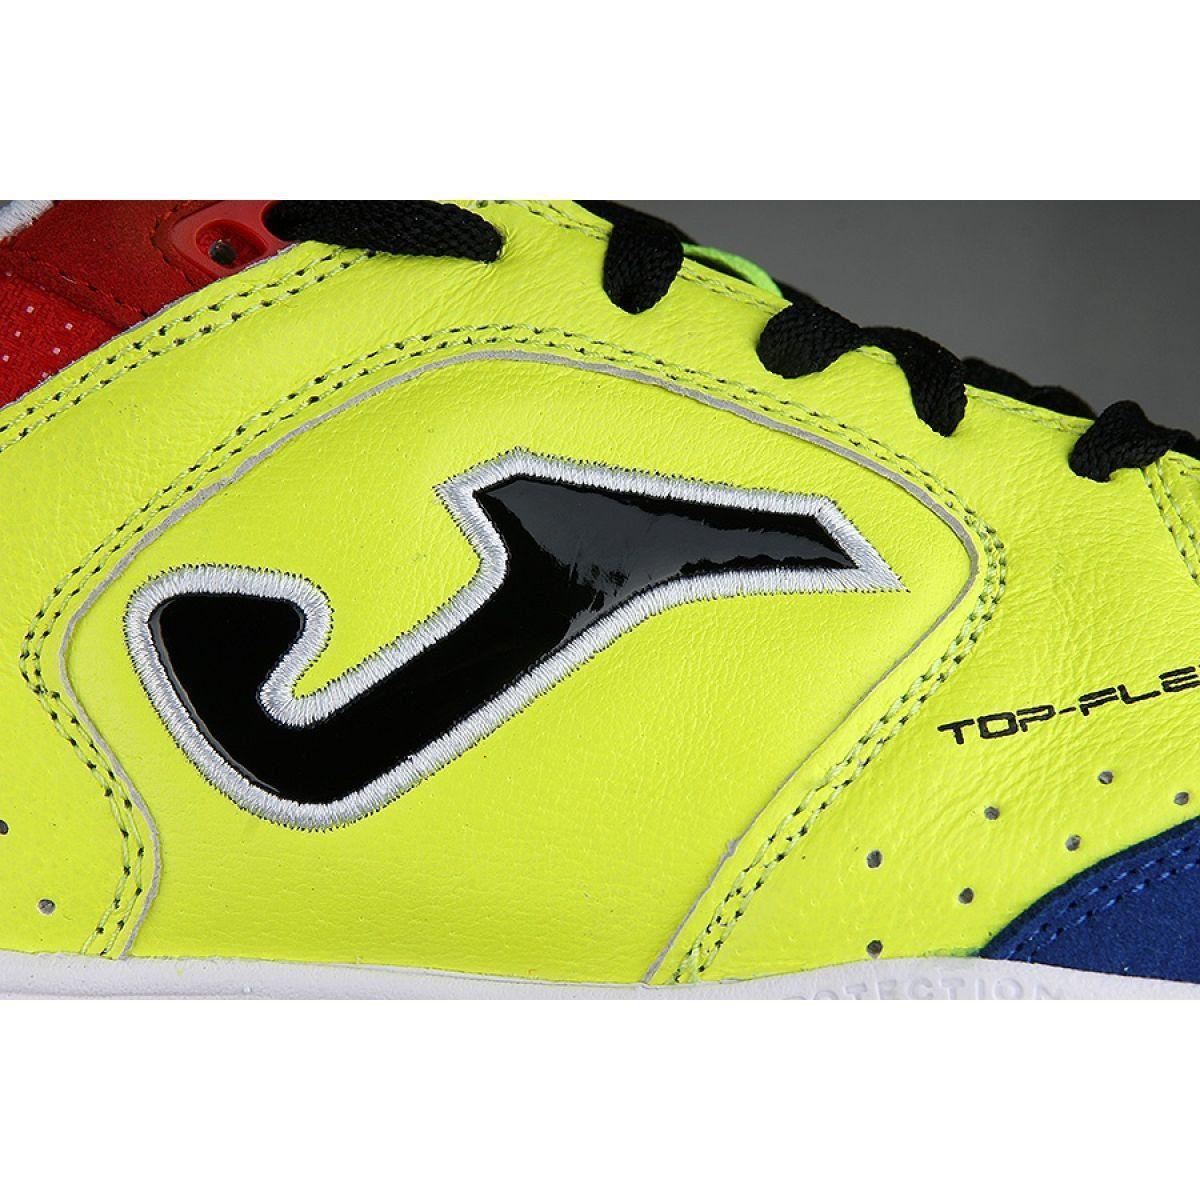 Buty Pilkarskie Joma Top Flex Tf 711 M Topw 711 Wielokolorowe Zolte Football Boots Joma Boots